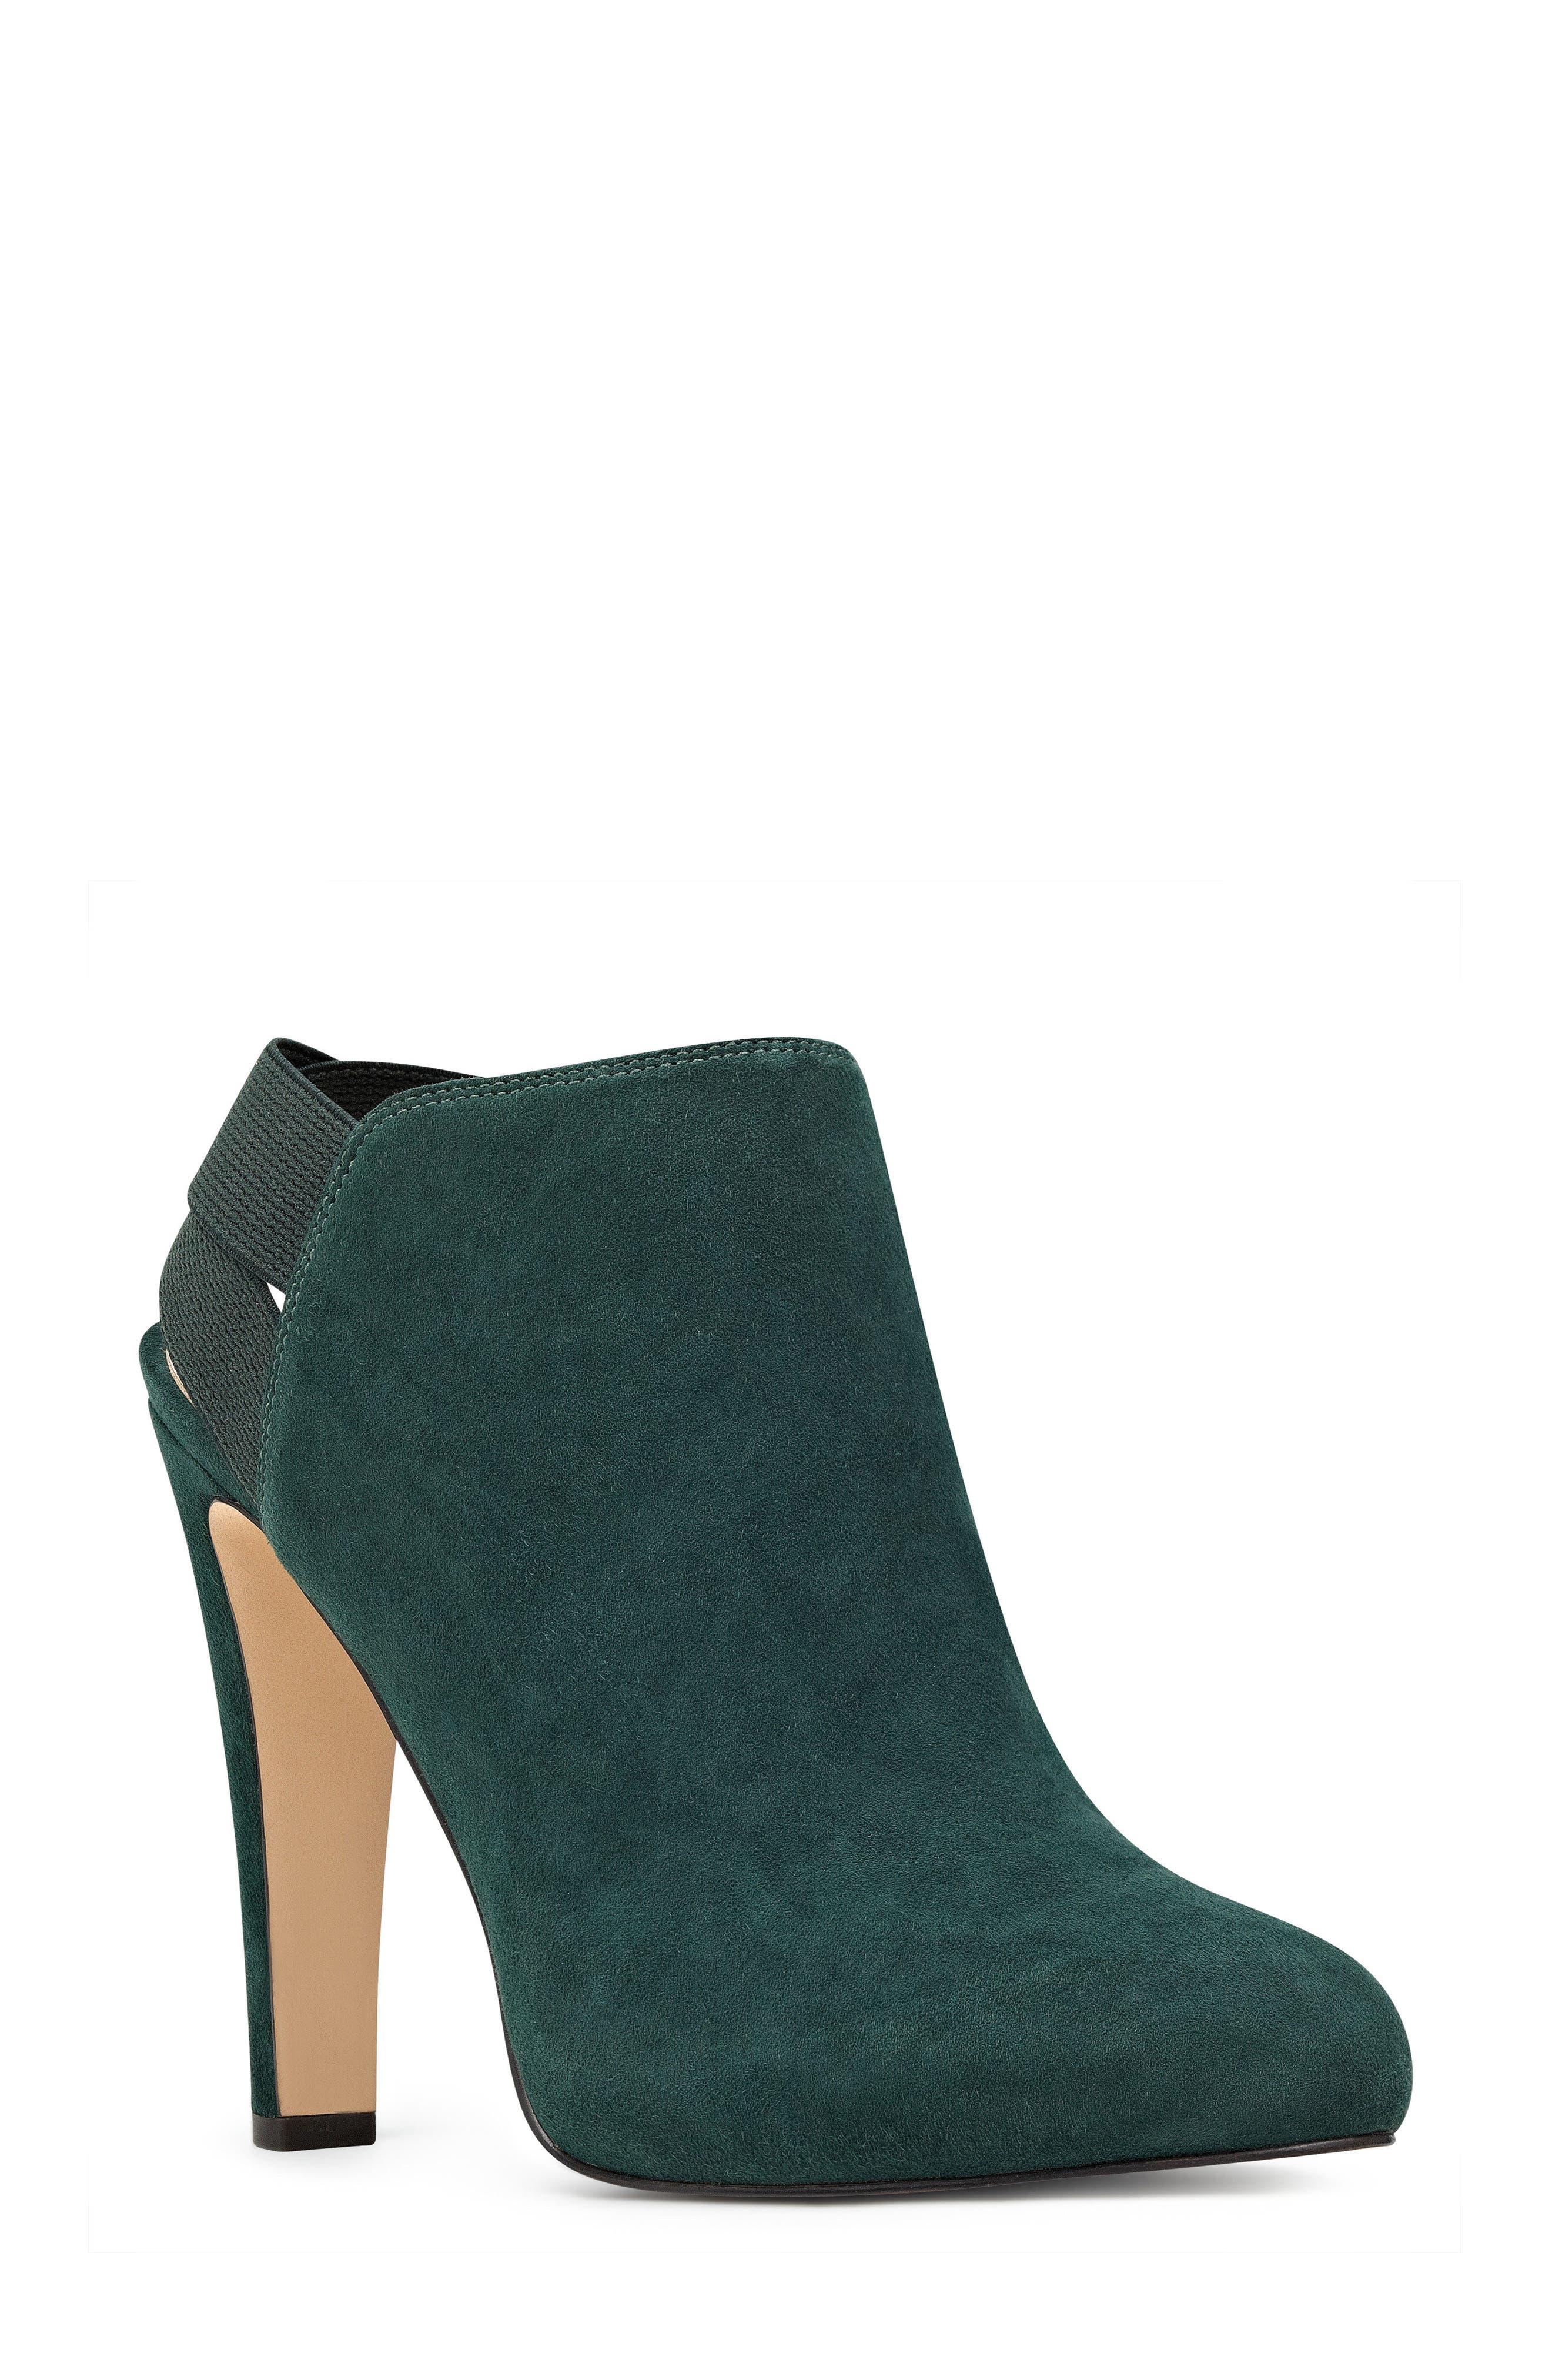 Burke Heel Strap Bootie,                         Main,                         color, Green/ Green Suede